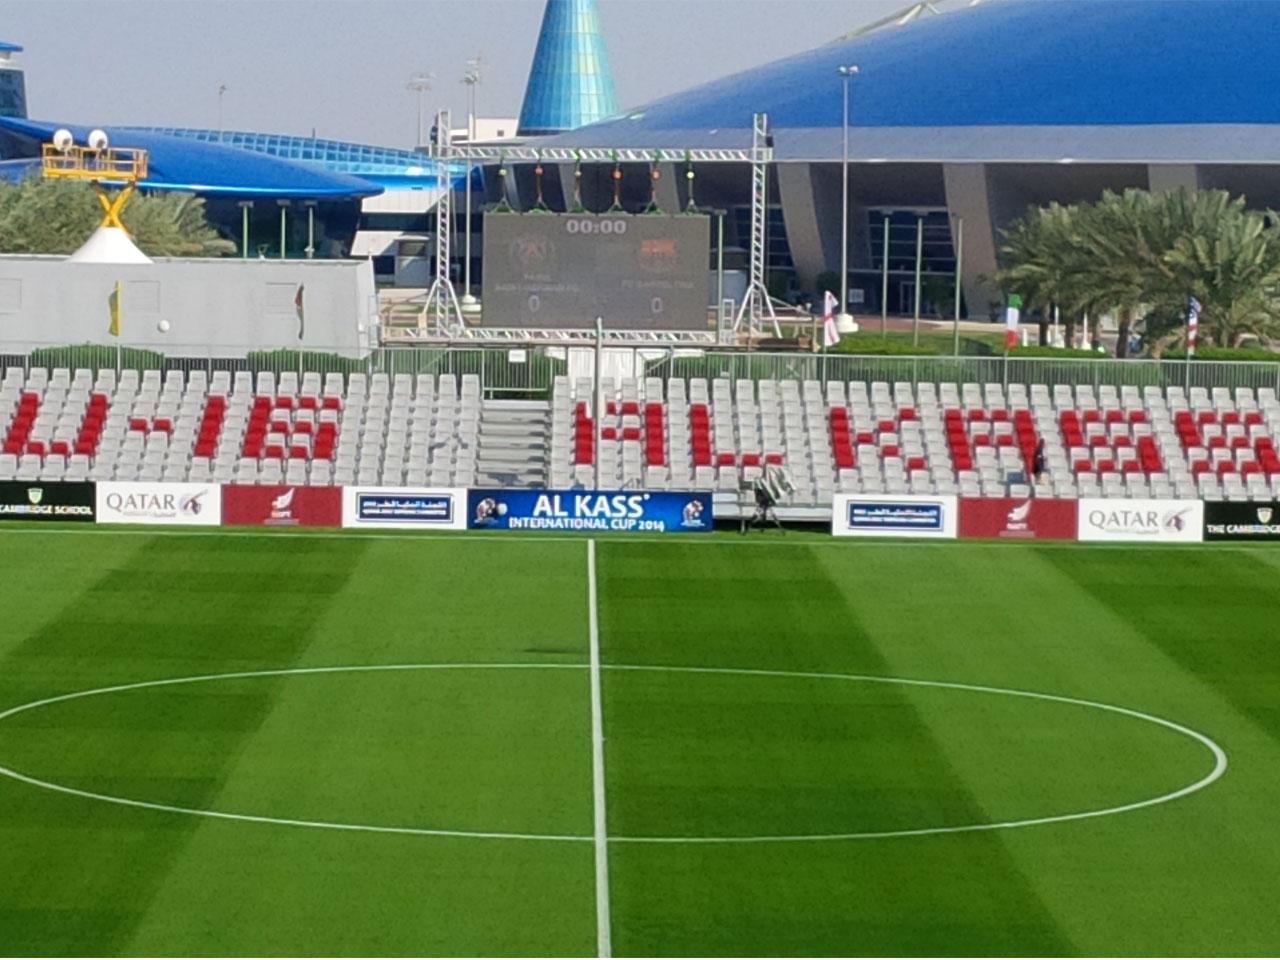 grandstand-seats-events-setup-rental-stadium-seating-sport-management-film-festival-seating-screening-f1-open-air-cinema-23